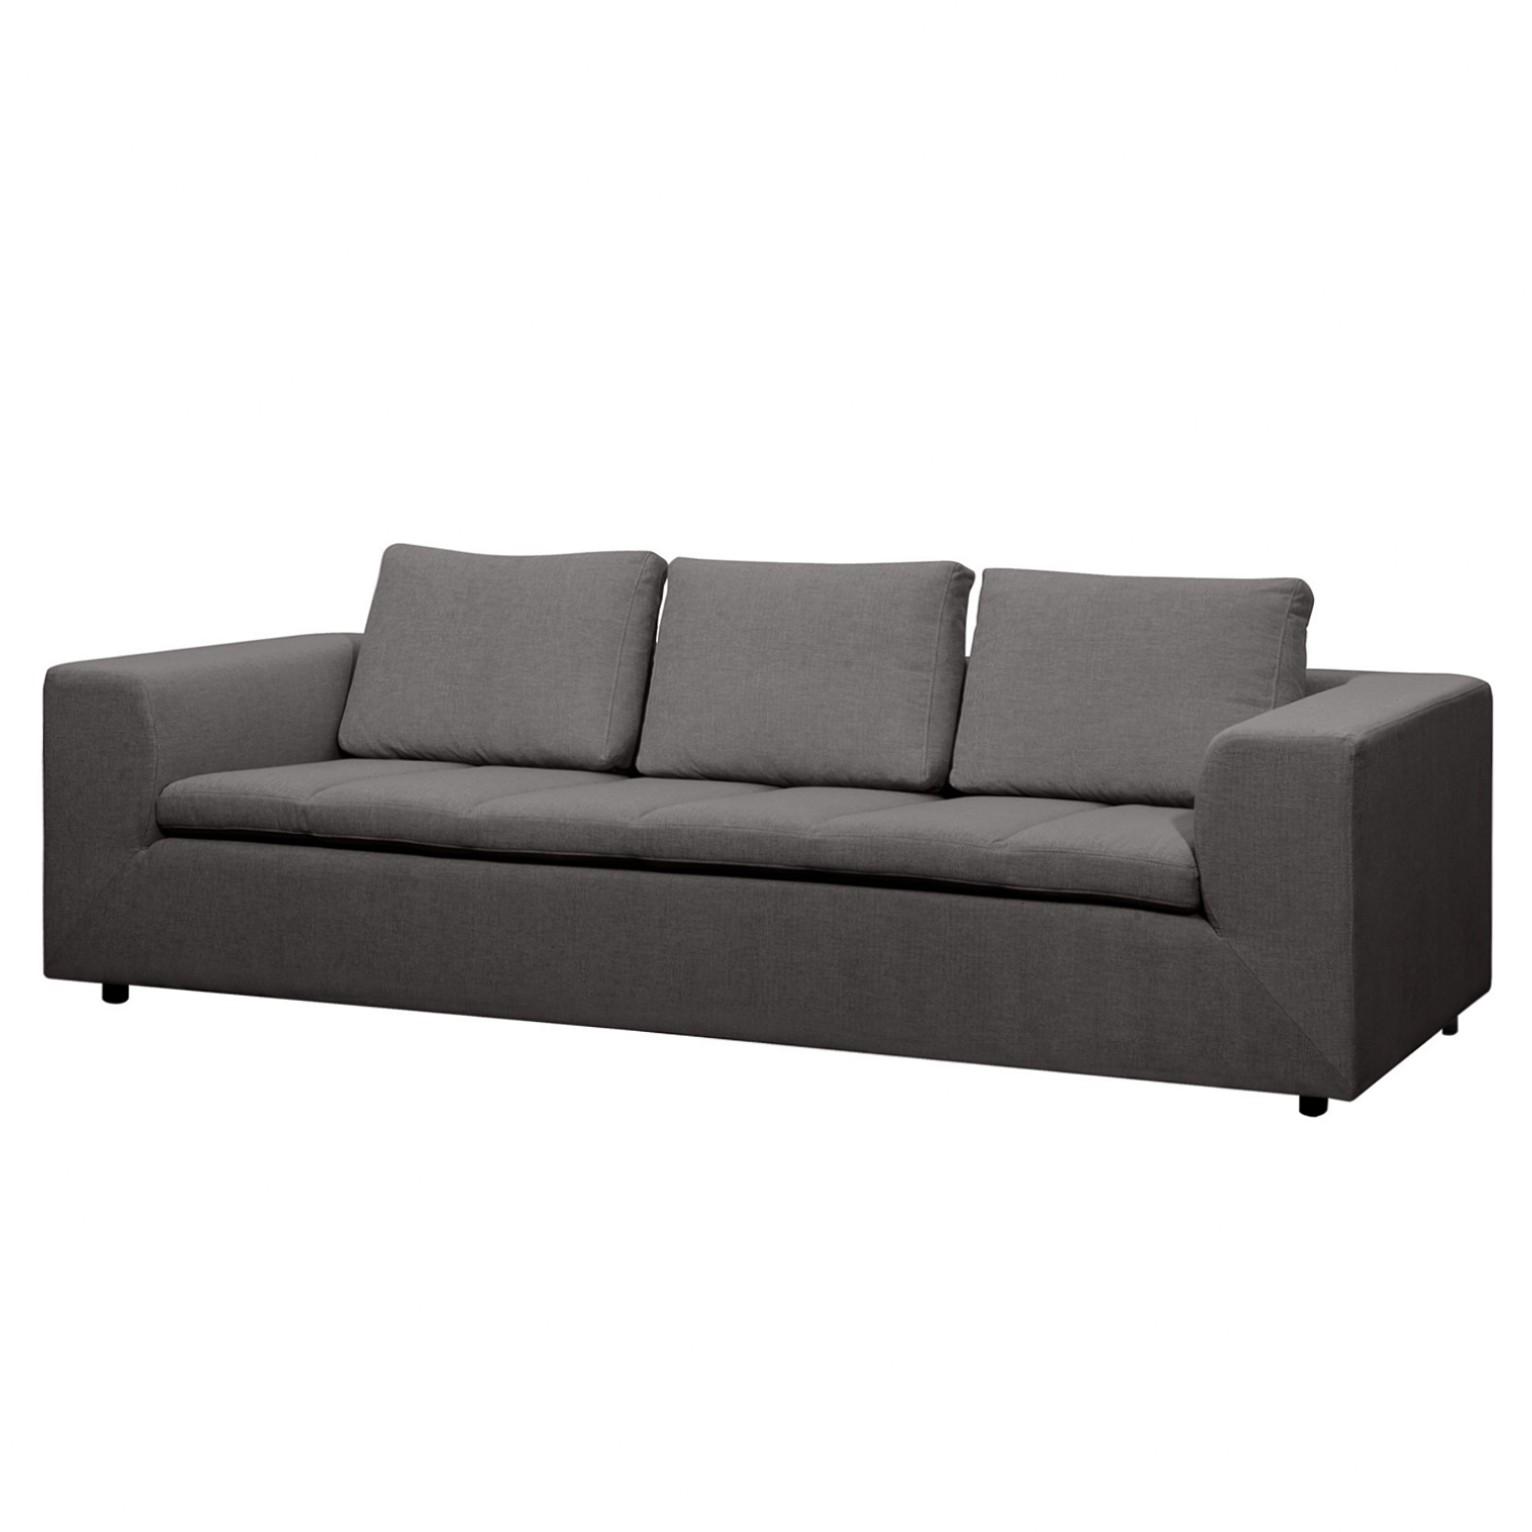 Sofa Brooklyn (3-Sitzer) Webstoff - Stoff Anda II Anthrazit